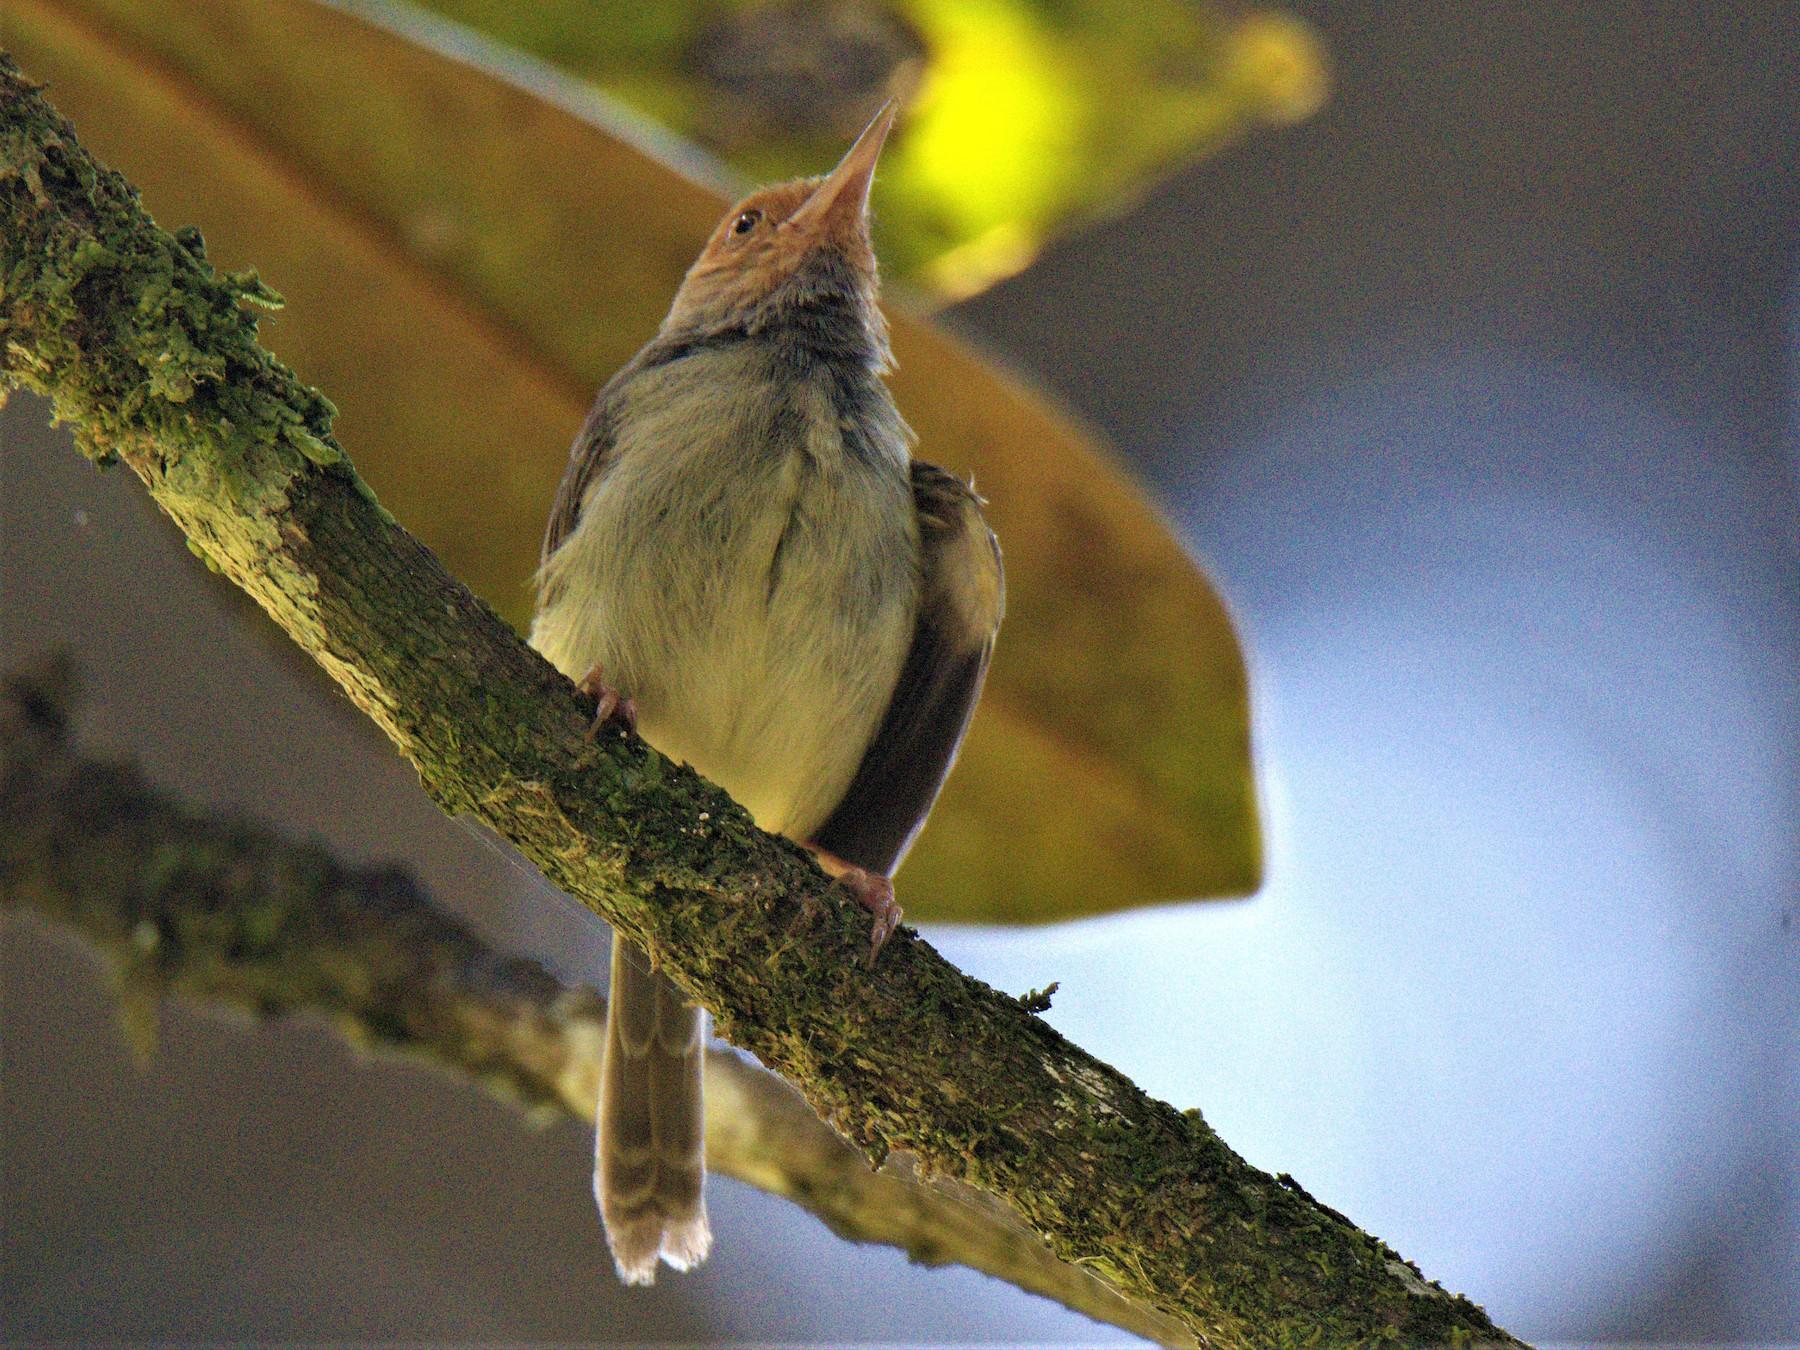 Olive-backed Tailorbird - Venkatesh VT